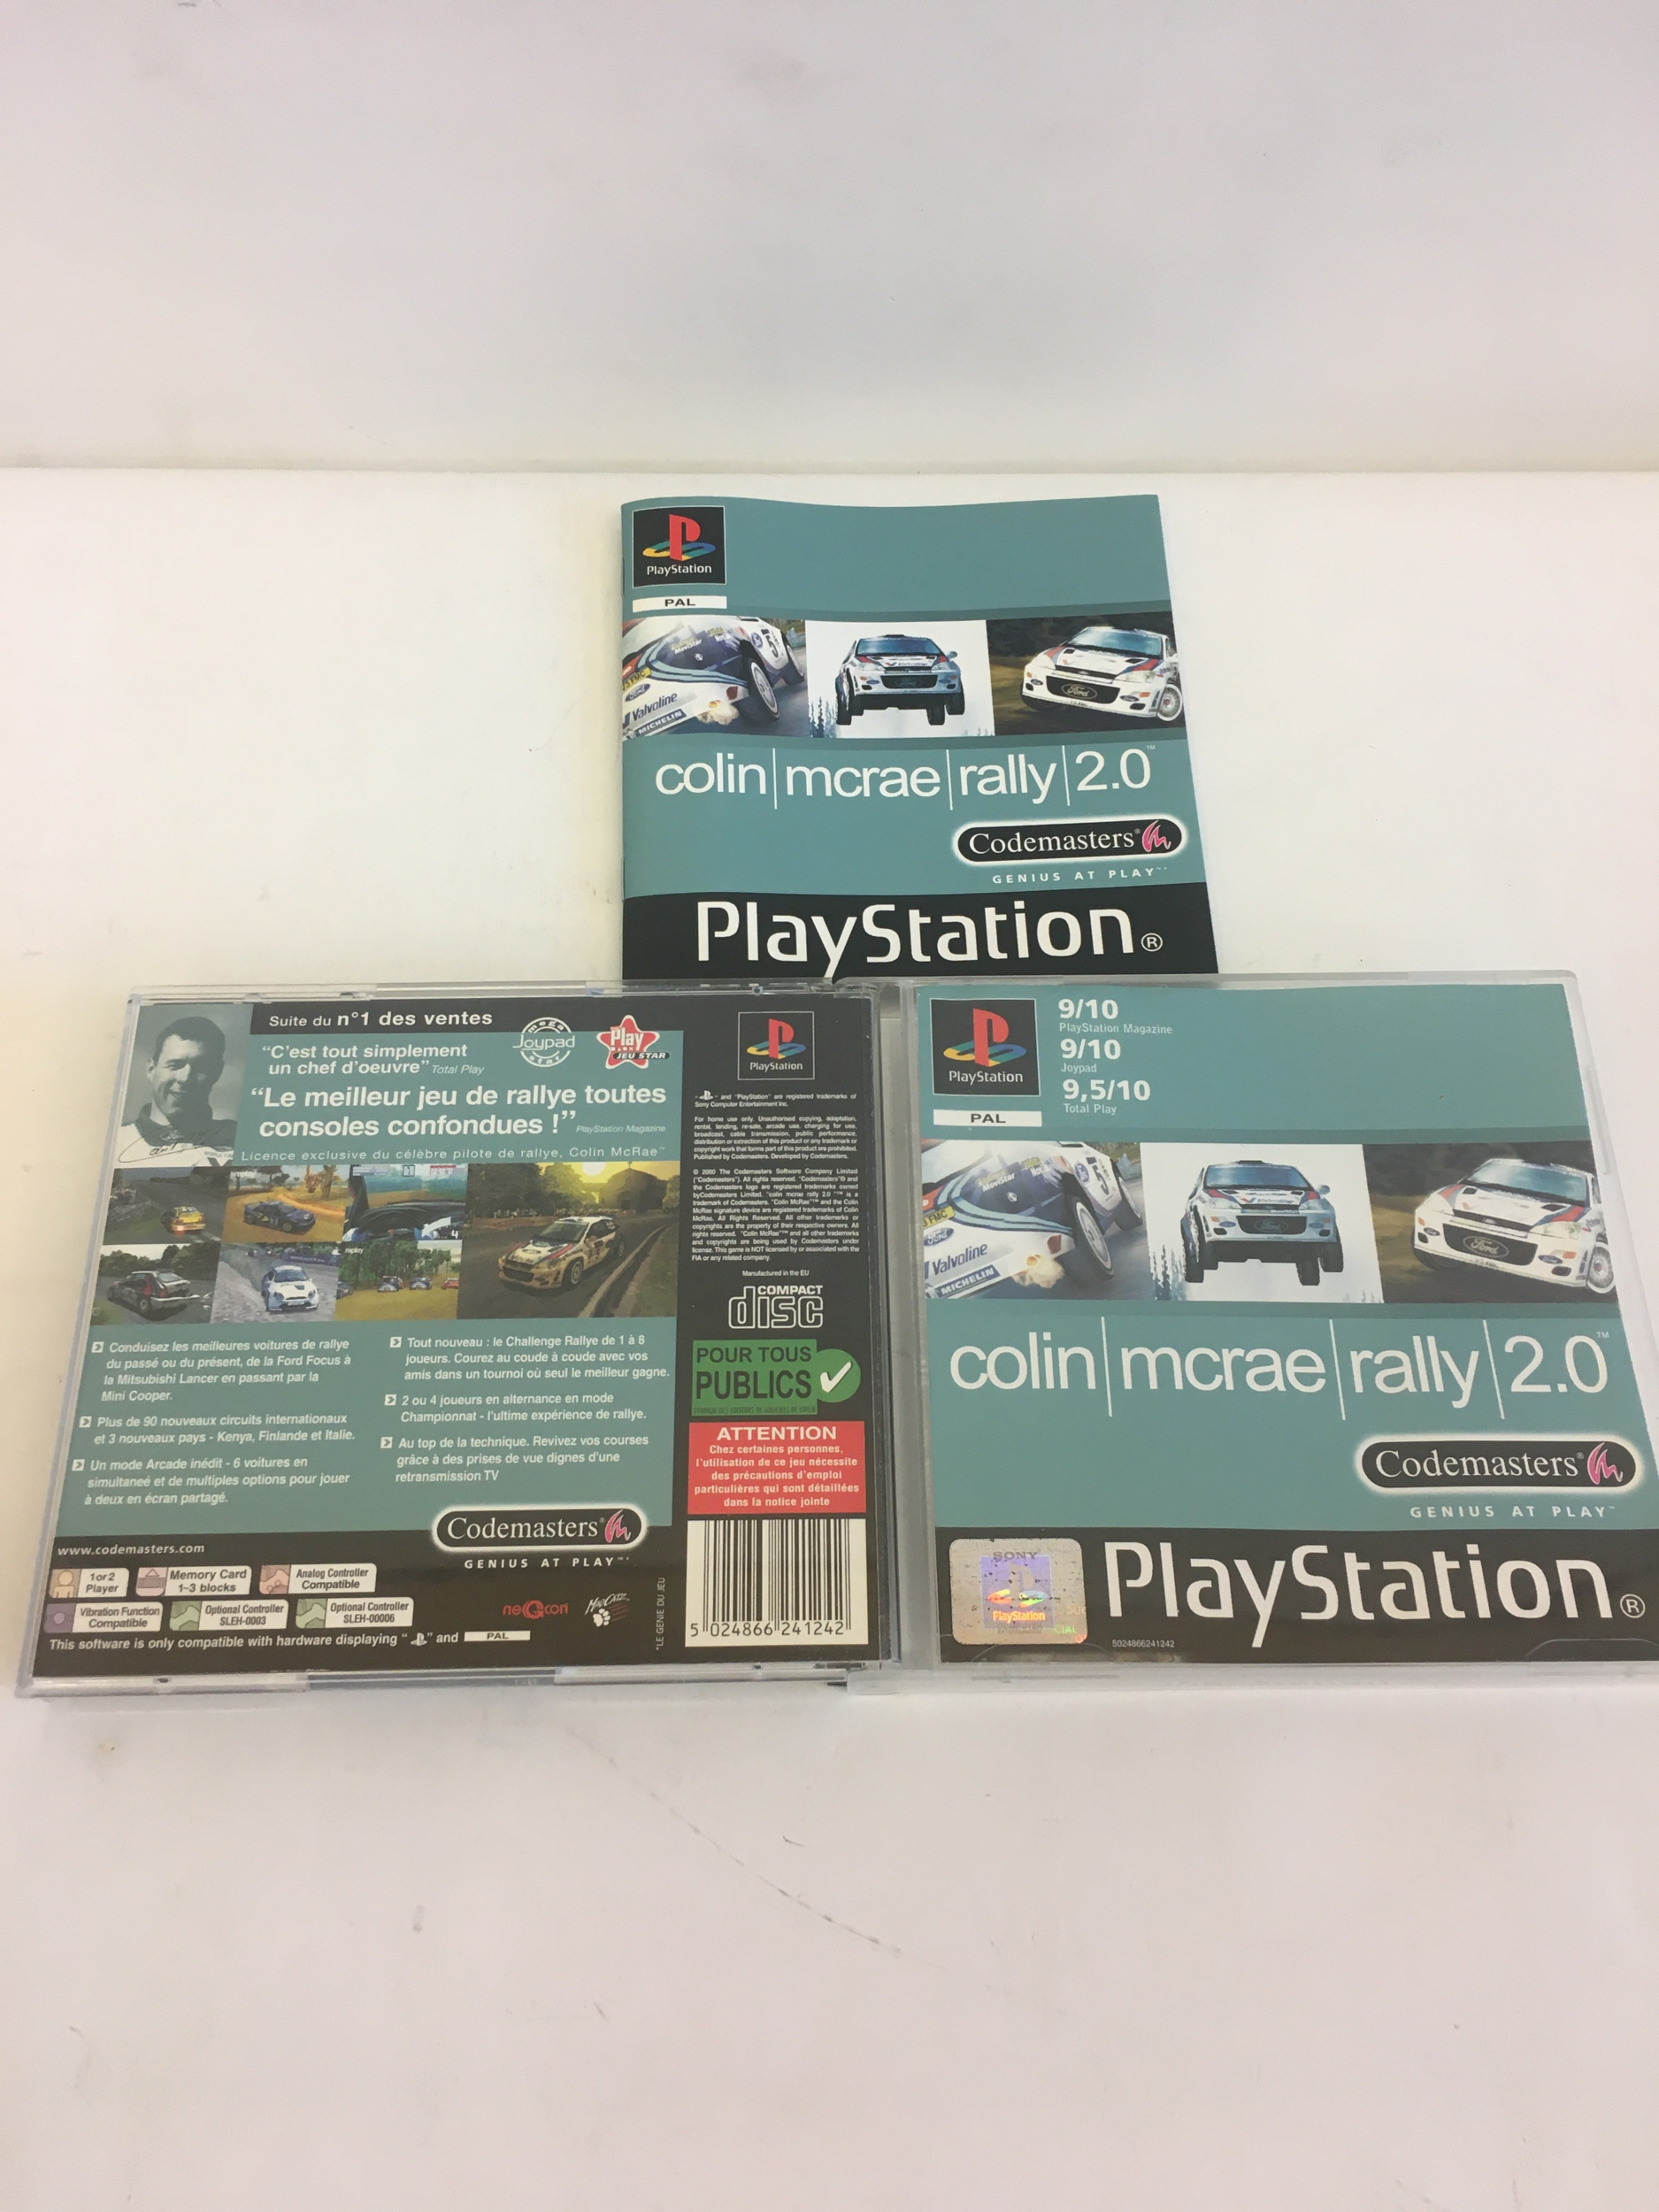 Colin McRae Rally 2.0 PS1